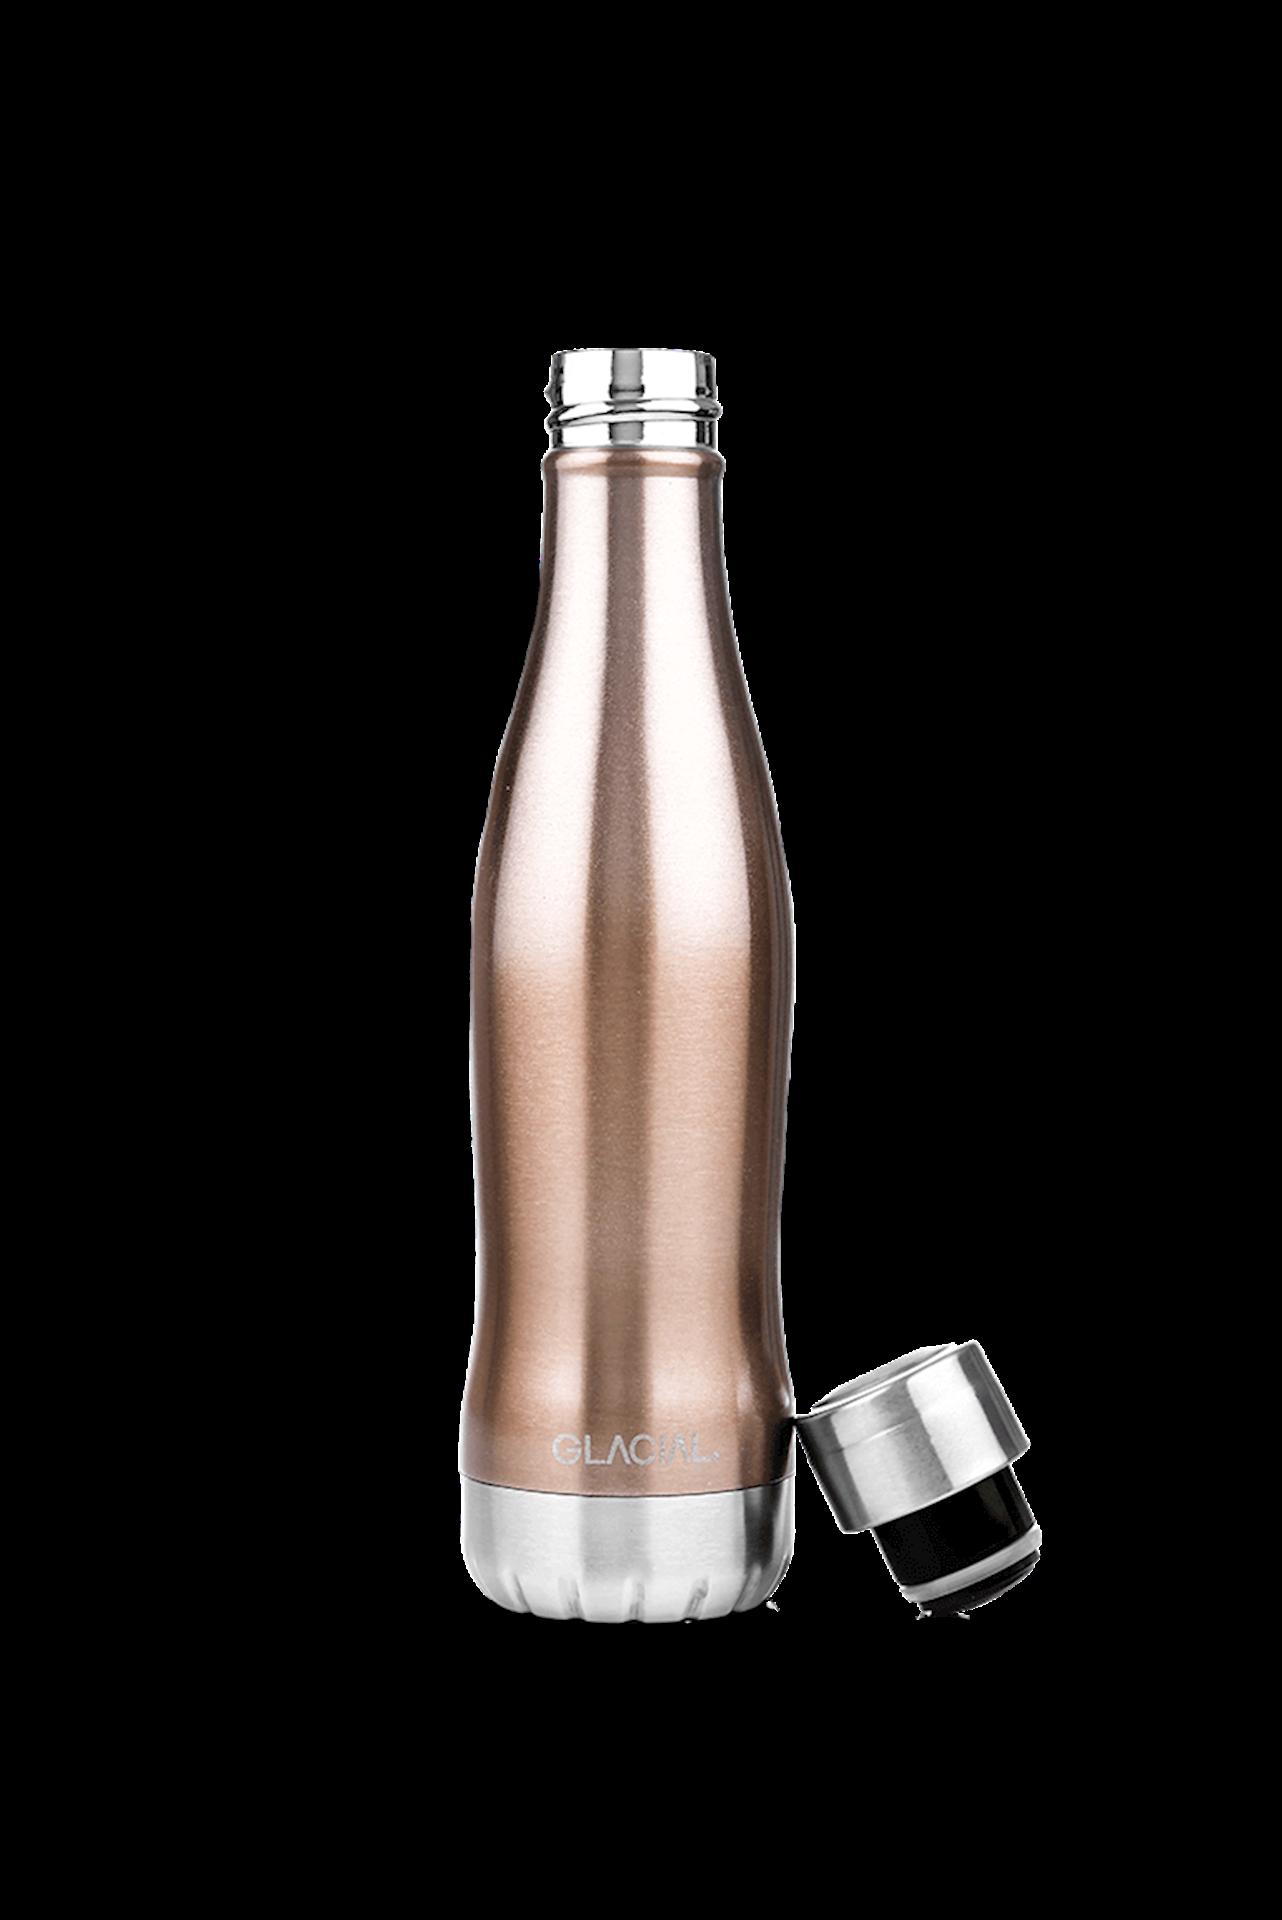 Glacial Glacial Bottle Rose Gold